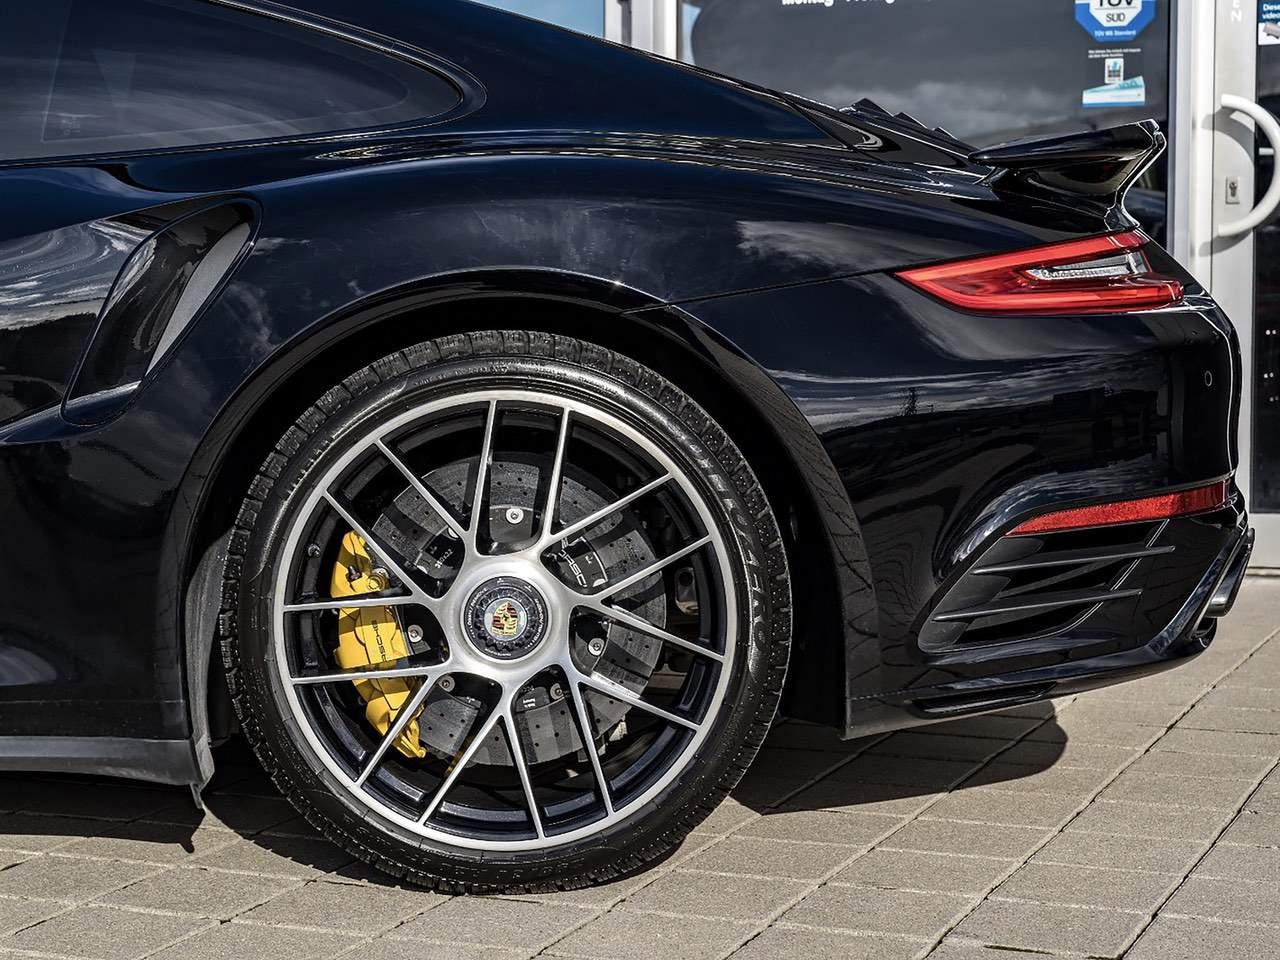 Porsche-911-Turbo-S-11